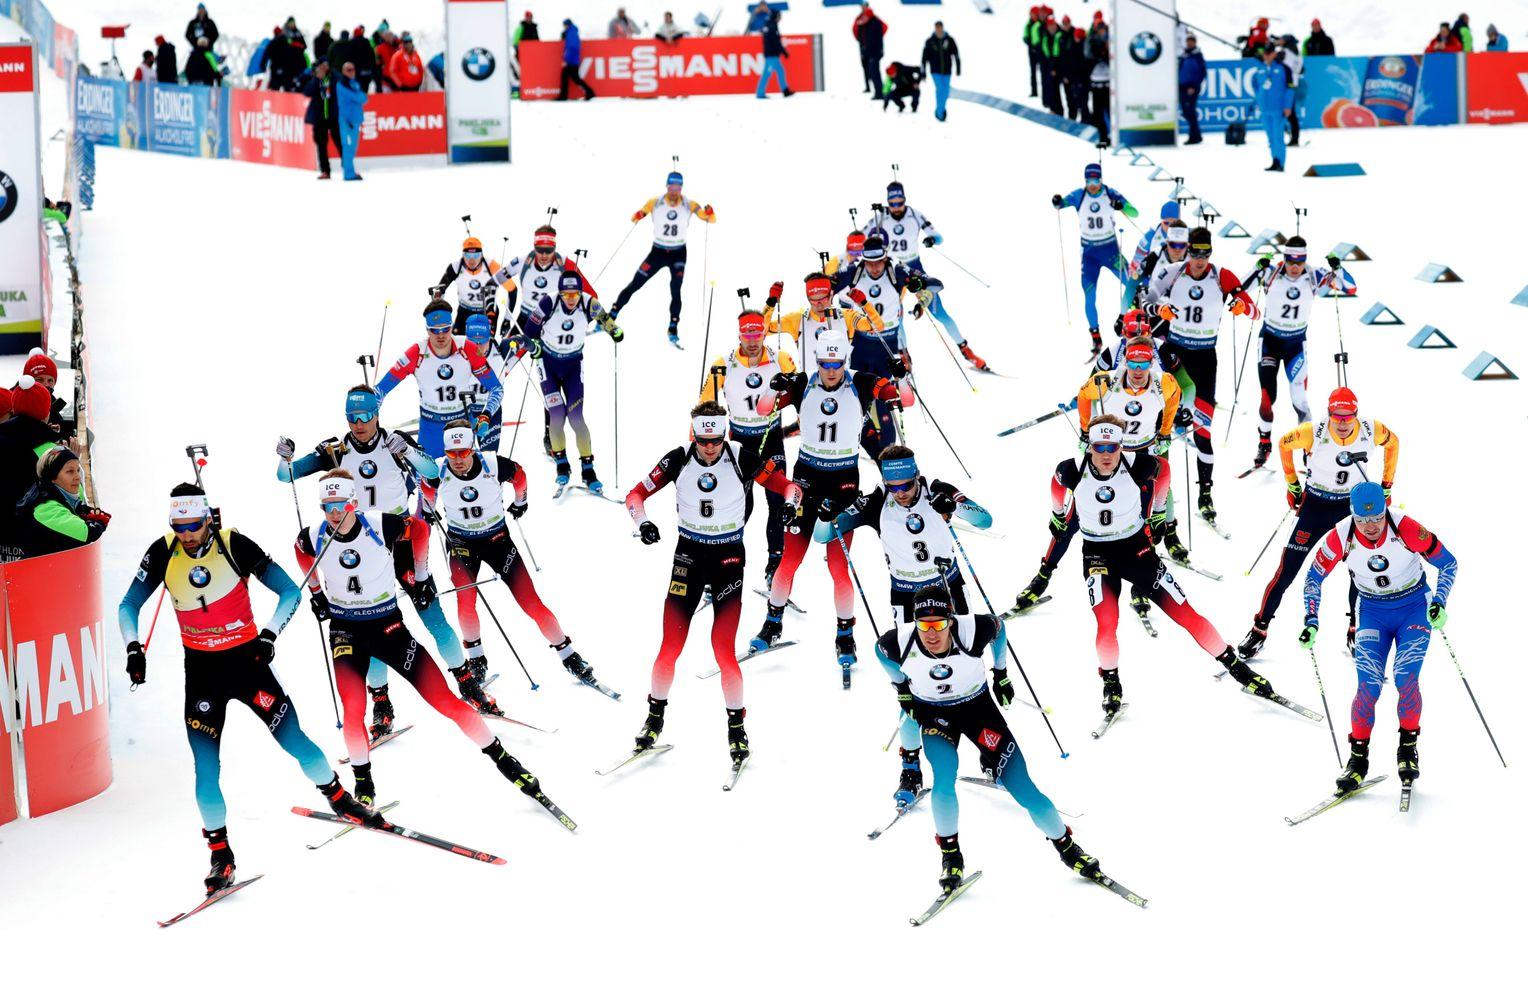 ergebnisse ski wm 2020